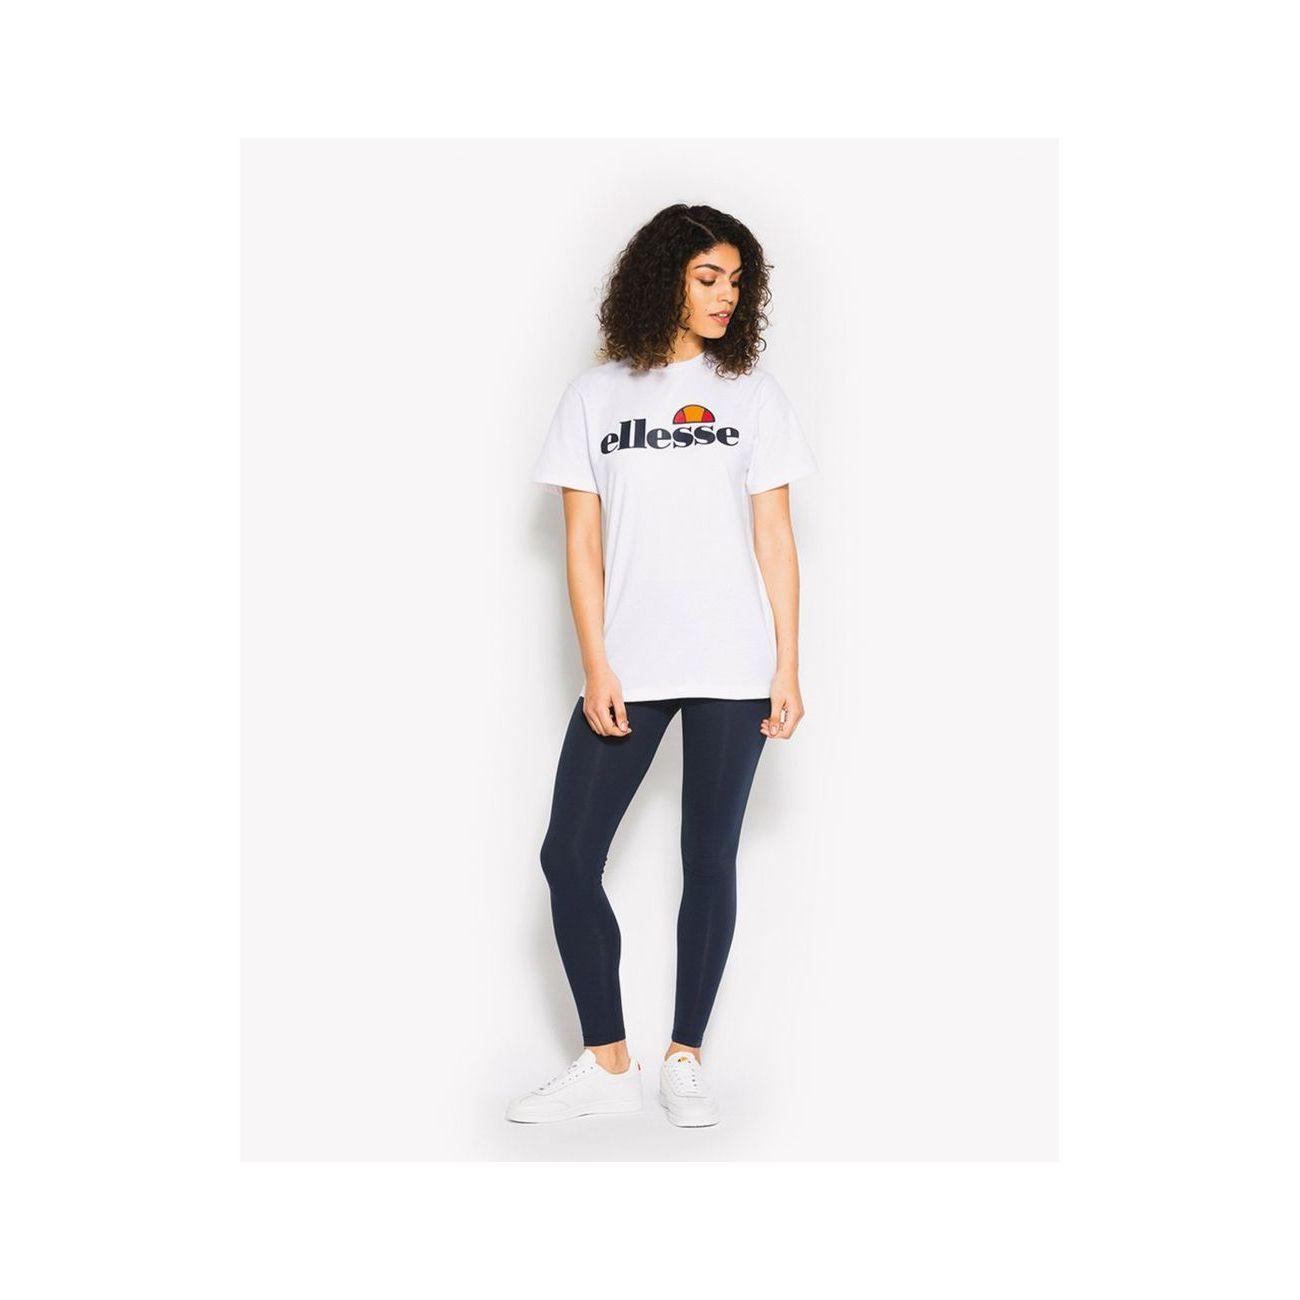 Athlétisme femme ELLESSE Ellesse Heritage Albany Womens Ladies Boyfriend Fashion T-Shirt Tee White - UK 12